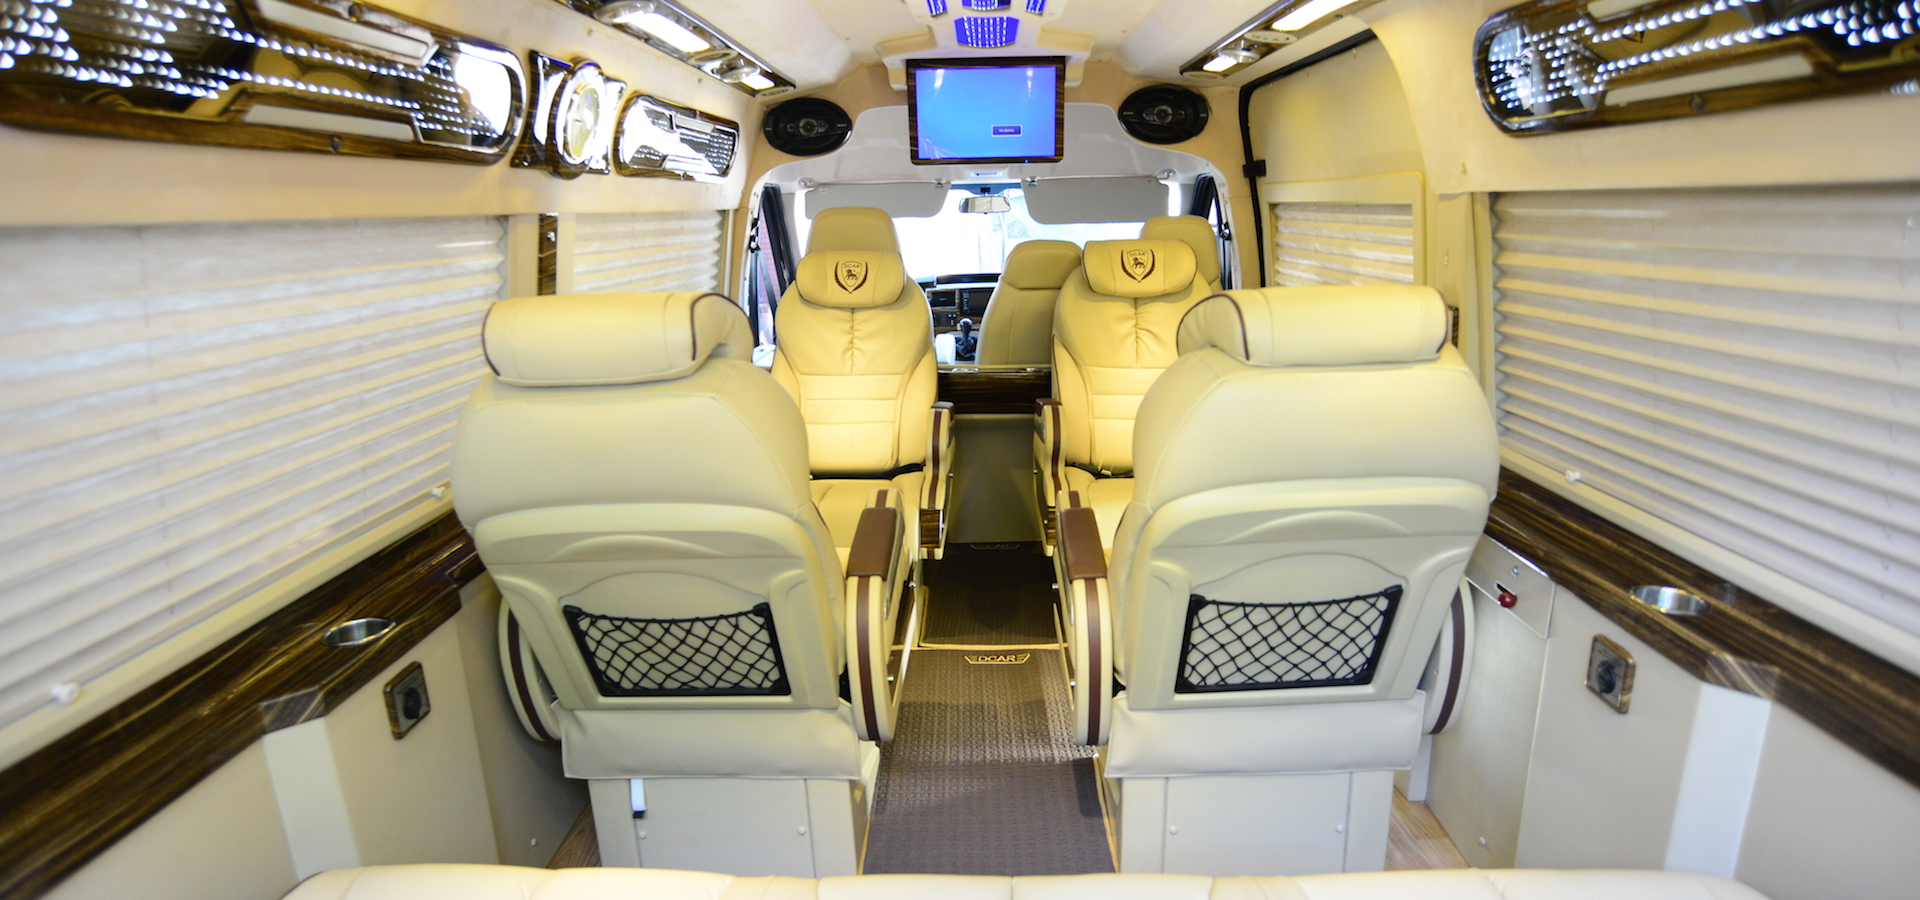 Ford Transit Dcar Limousine 2021 (Bản 10 chỗ)5